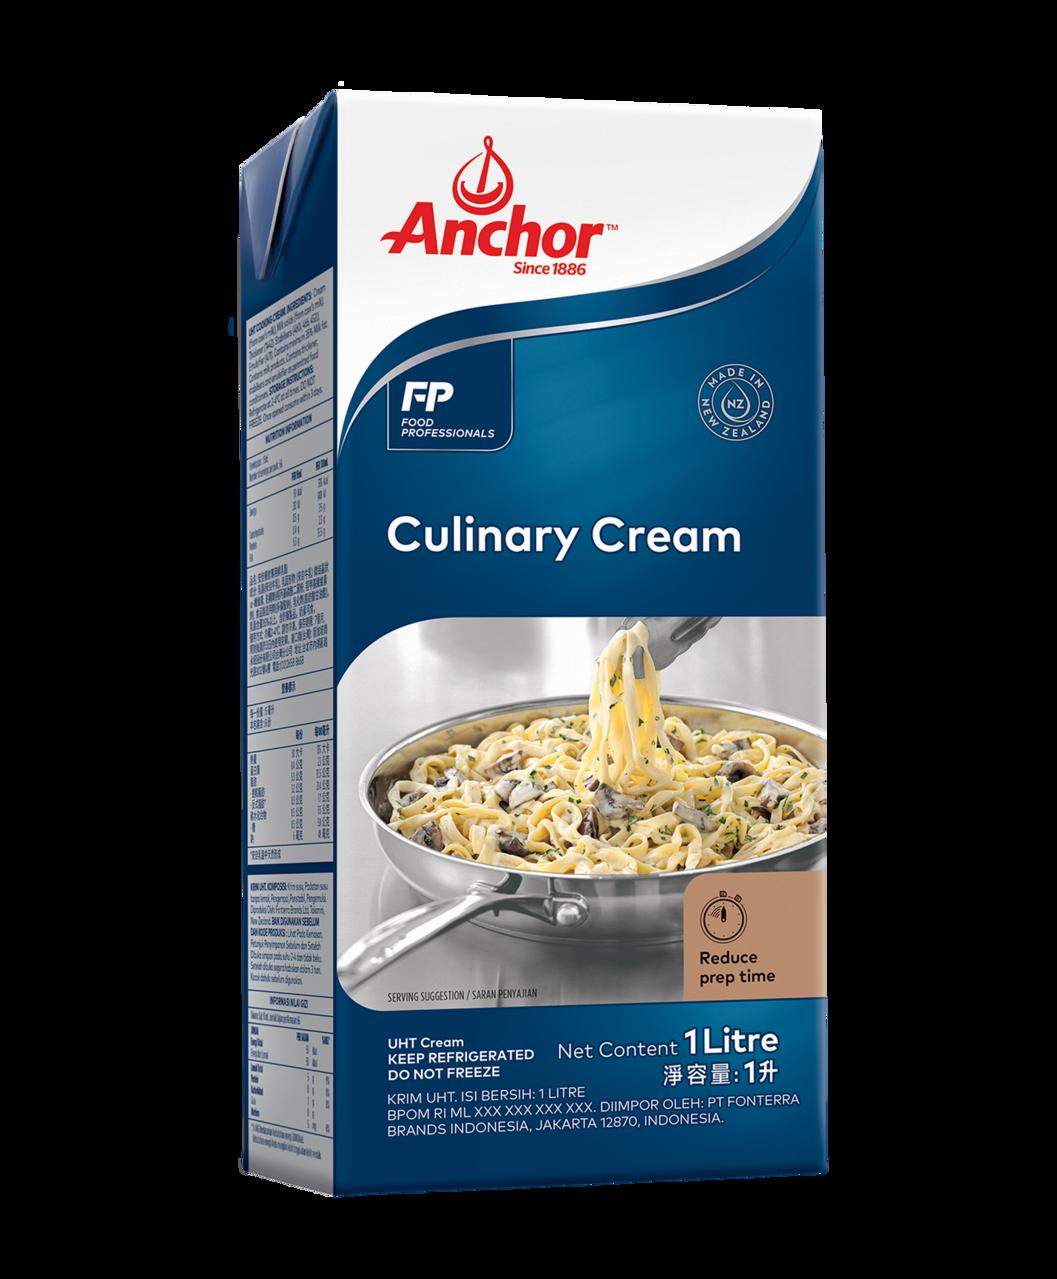 Anchor Culinary Cream